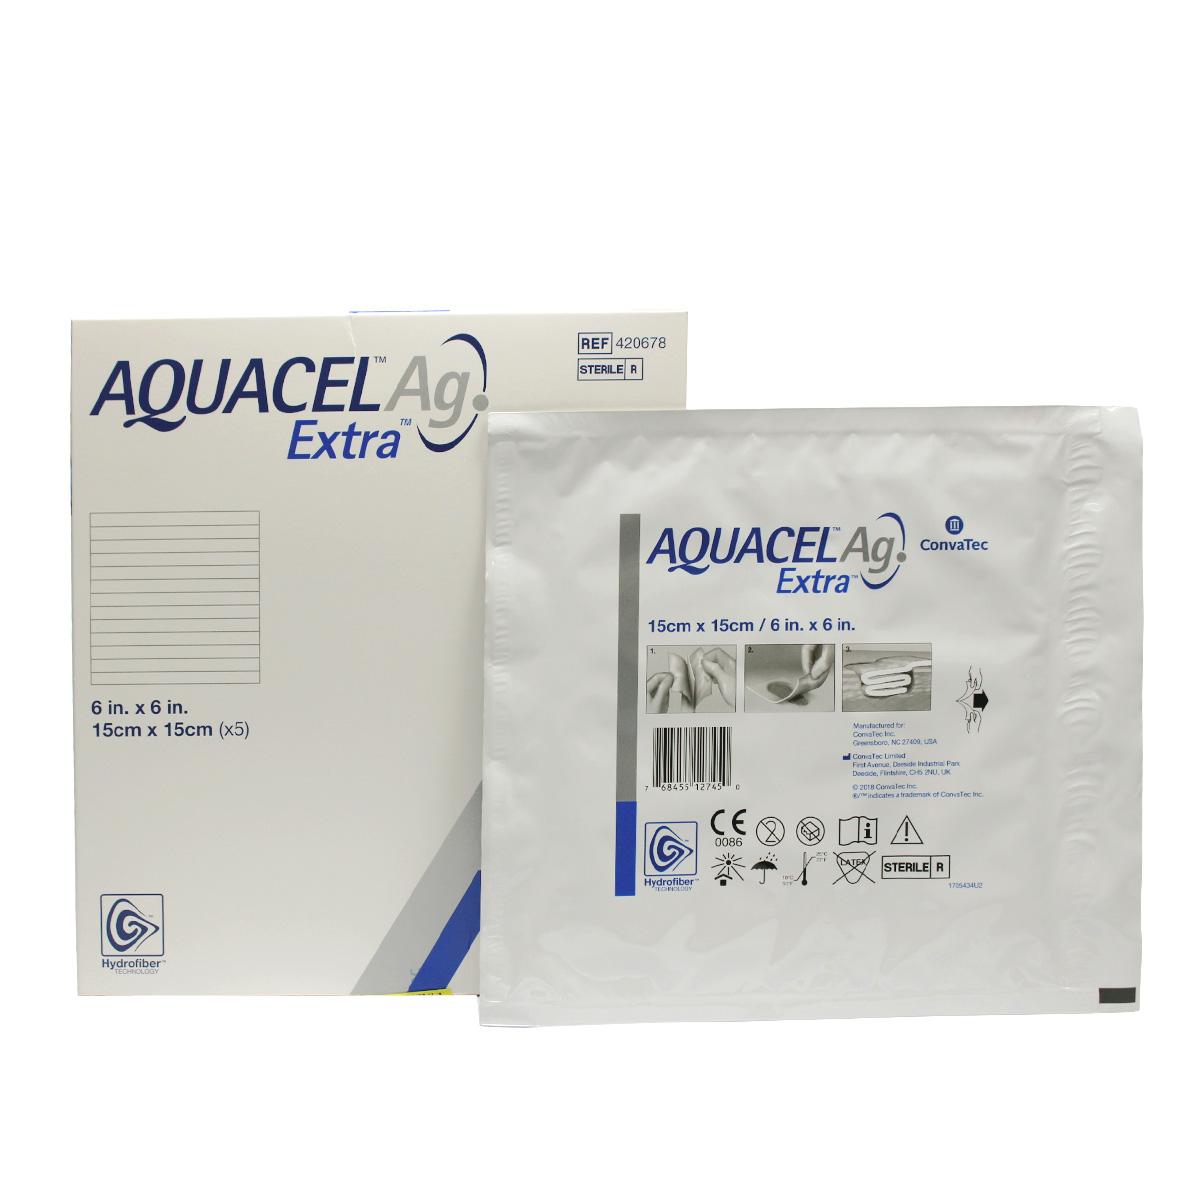 CURATIVO AQUACEL EXTRA AG 15 X 15 CM (UND) 420678 - CONVATEC